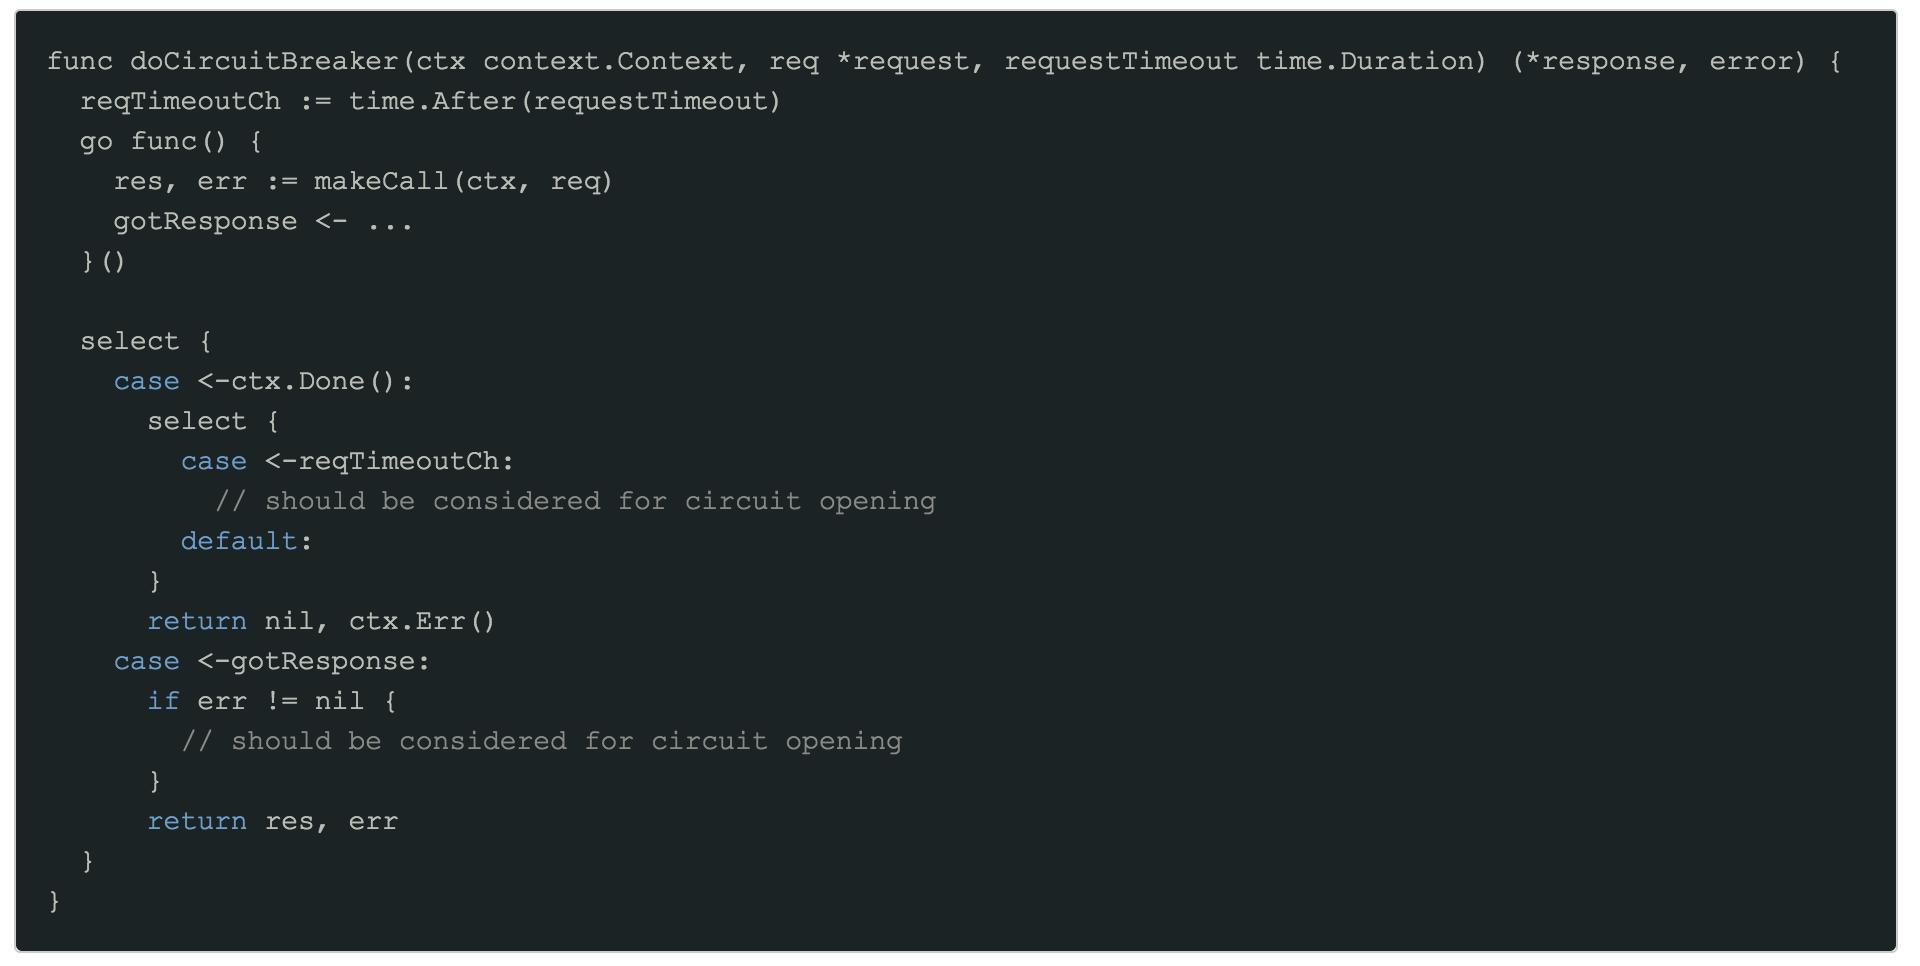 Introduce circuit-breaker logic code - 2